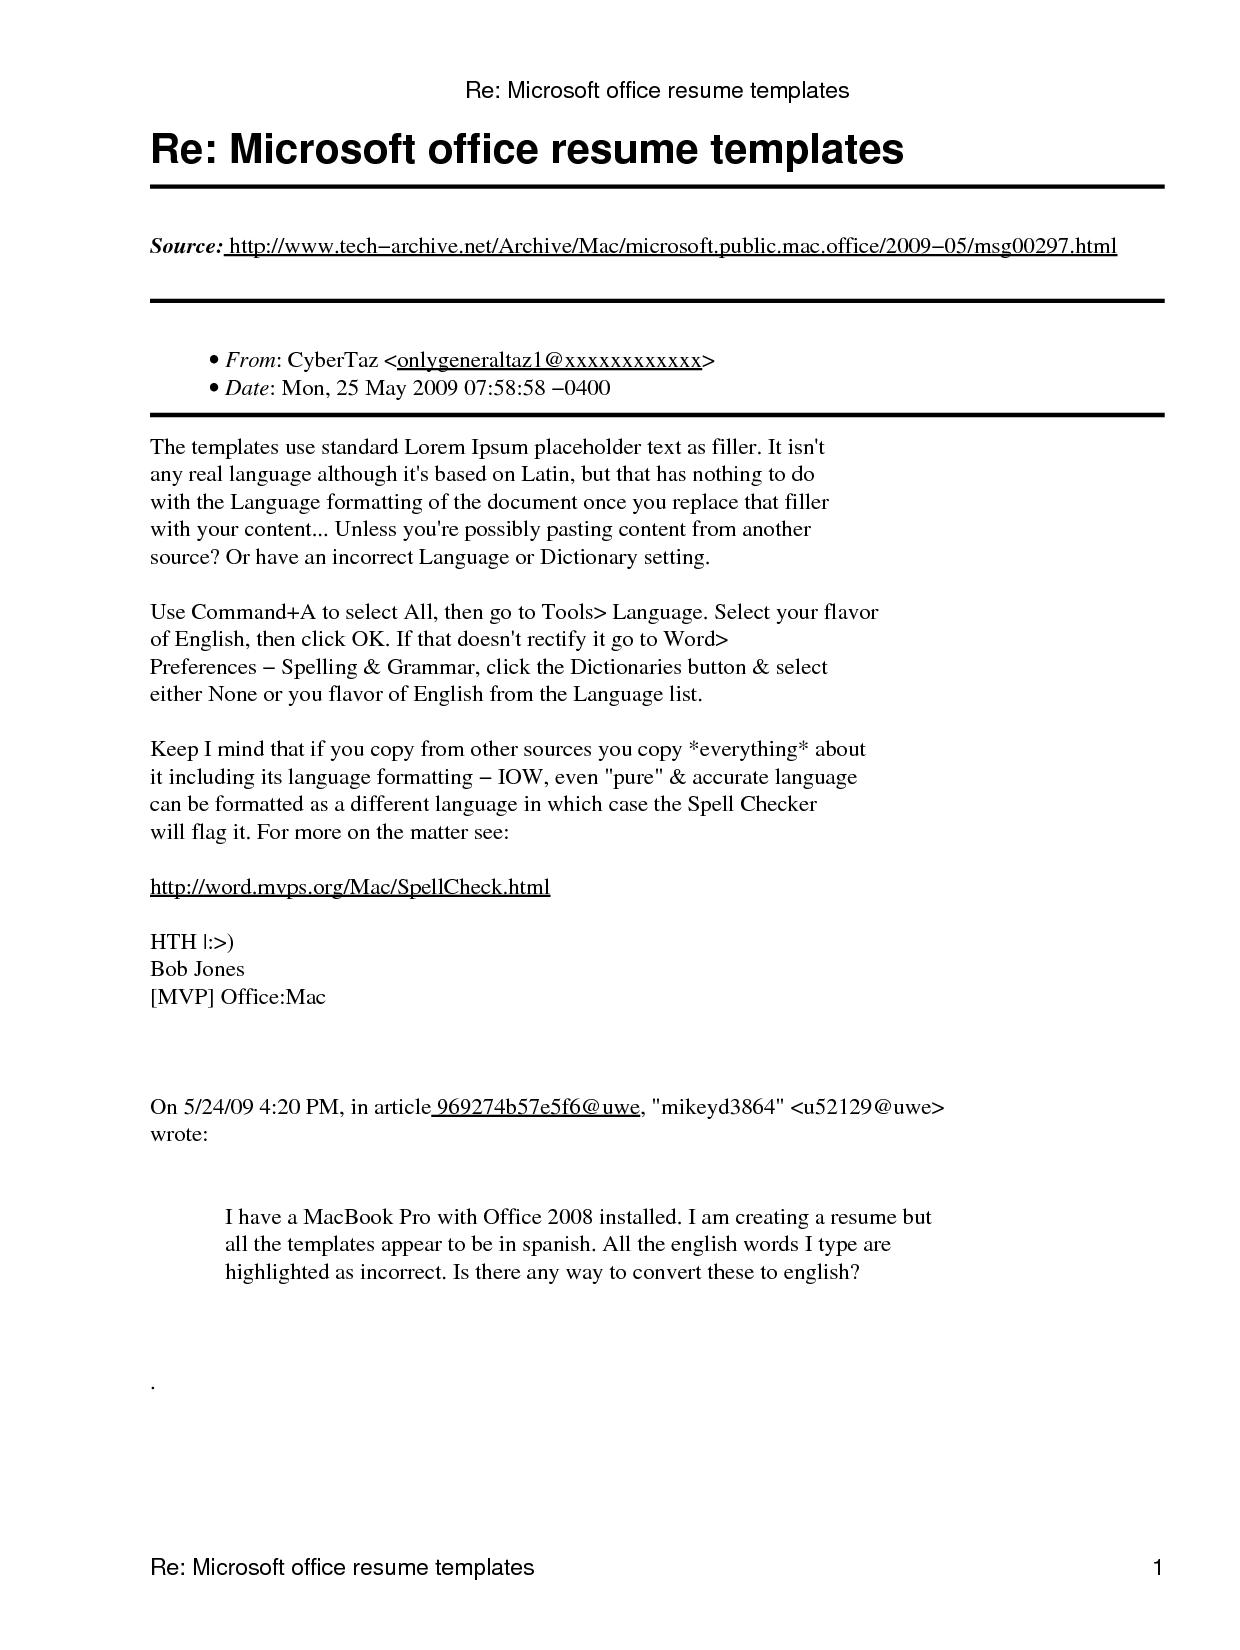 Microsoft Office Resume Template Resumecareer Info